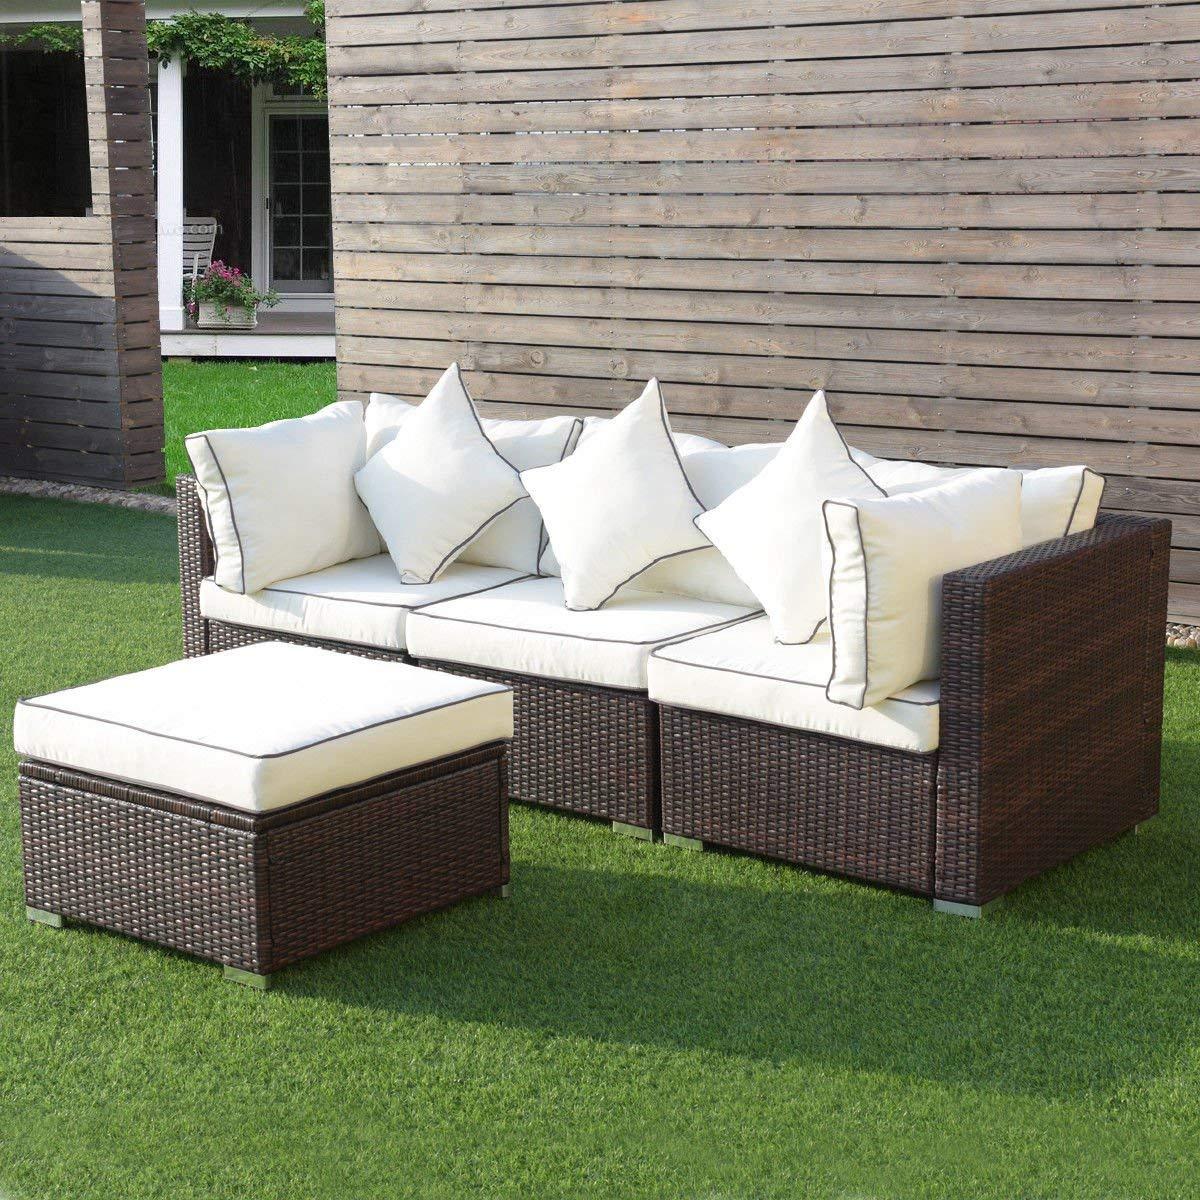 Amazon com tangkula 4pcs patio wicker sofa furniture set outdoor patio garden lawn modern wicker rattan sofa cushioned seat garden outdoor